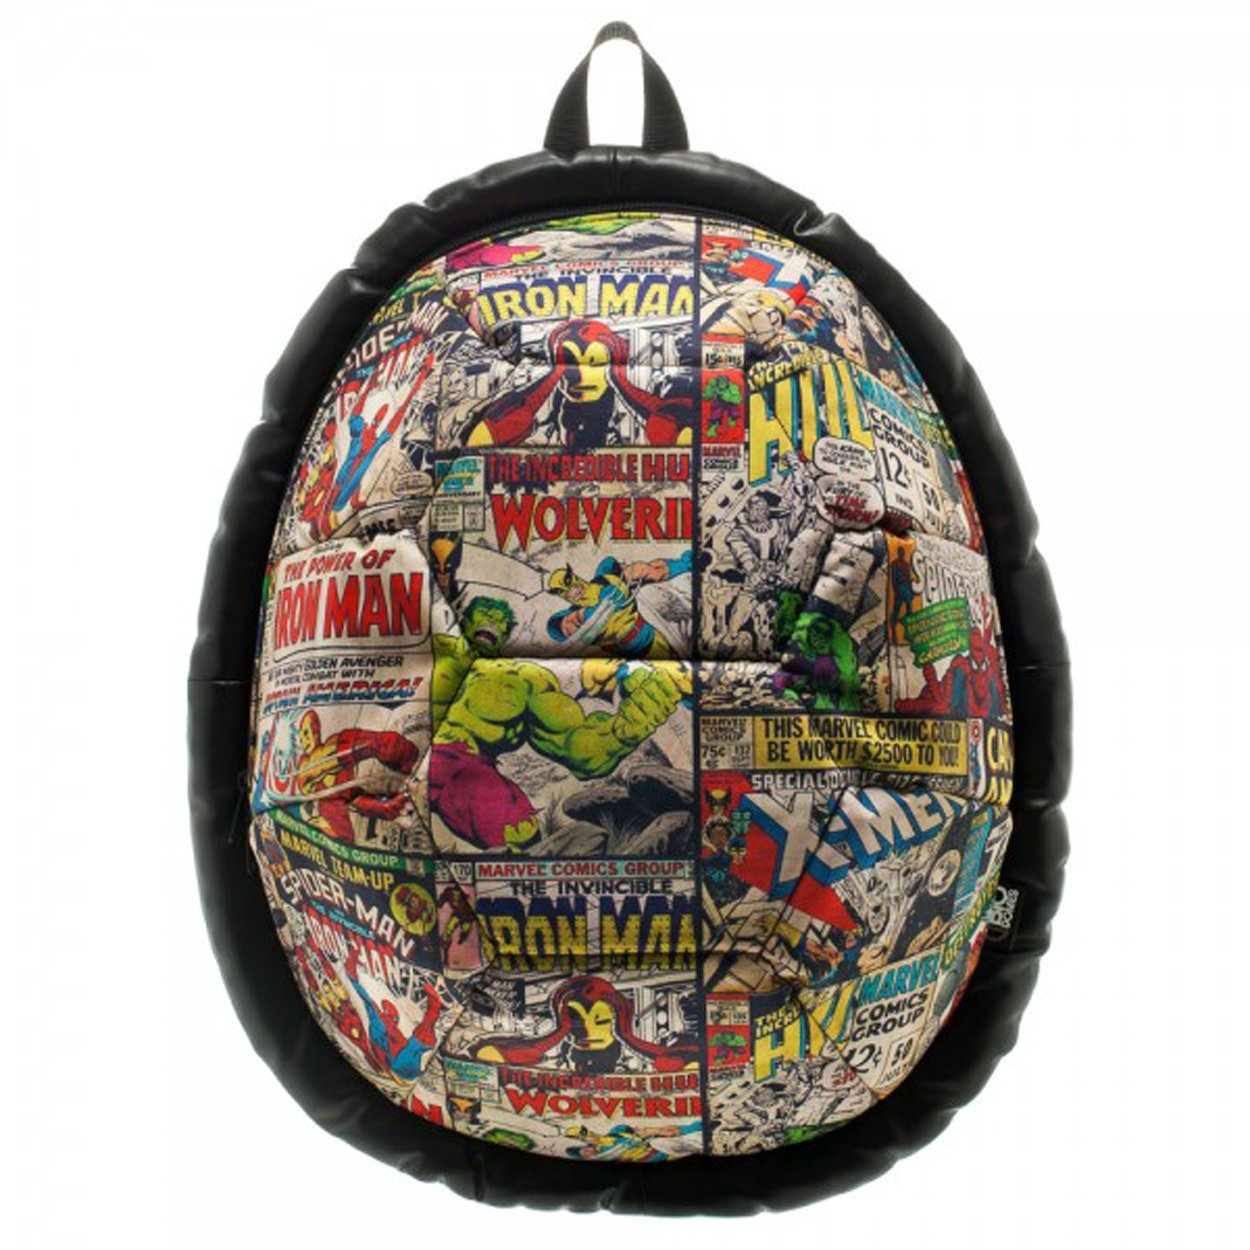 Backpack - Marvel - Comic Sublimated Comic Print Biodome New Anime bp1l73mvl B00LUYWFQW